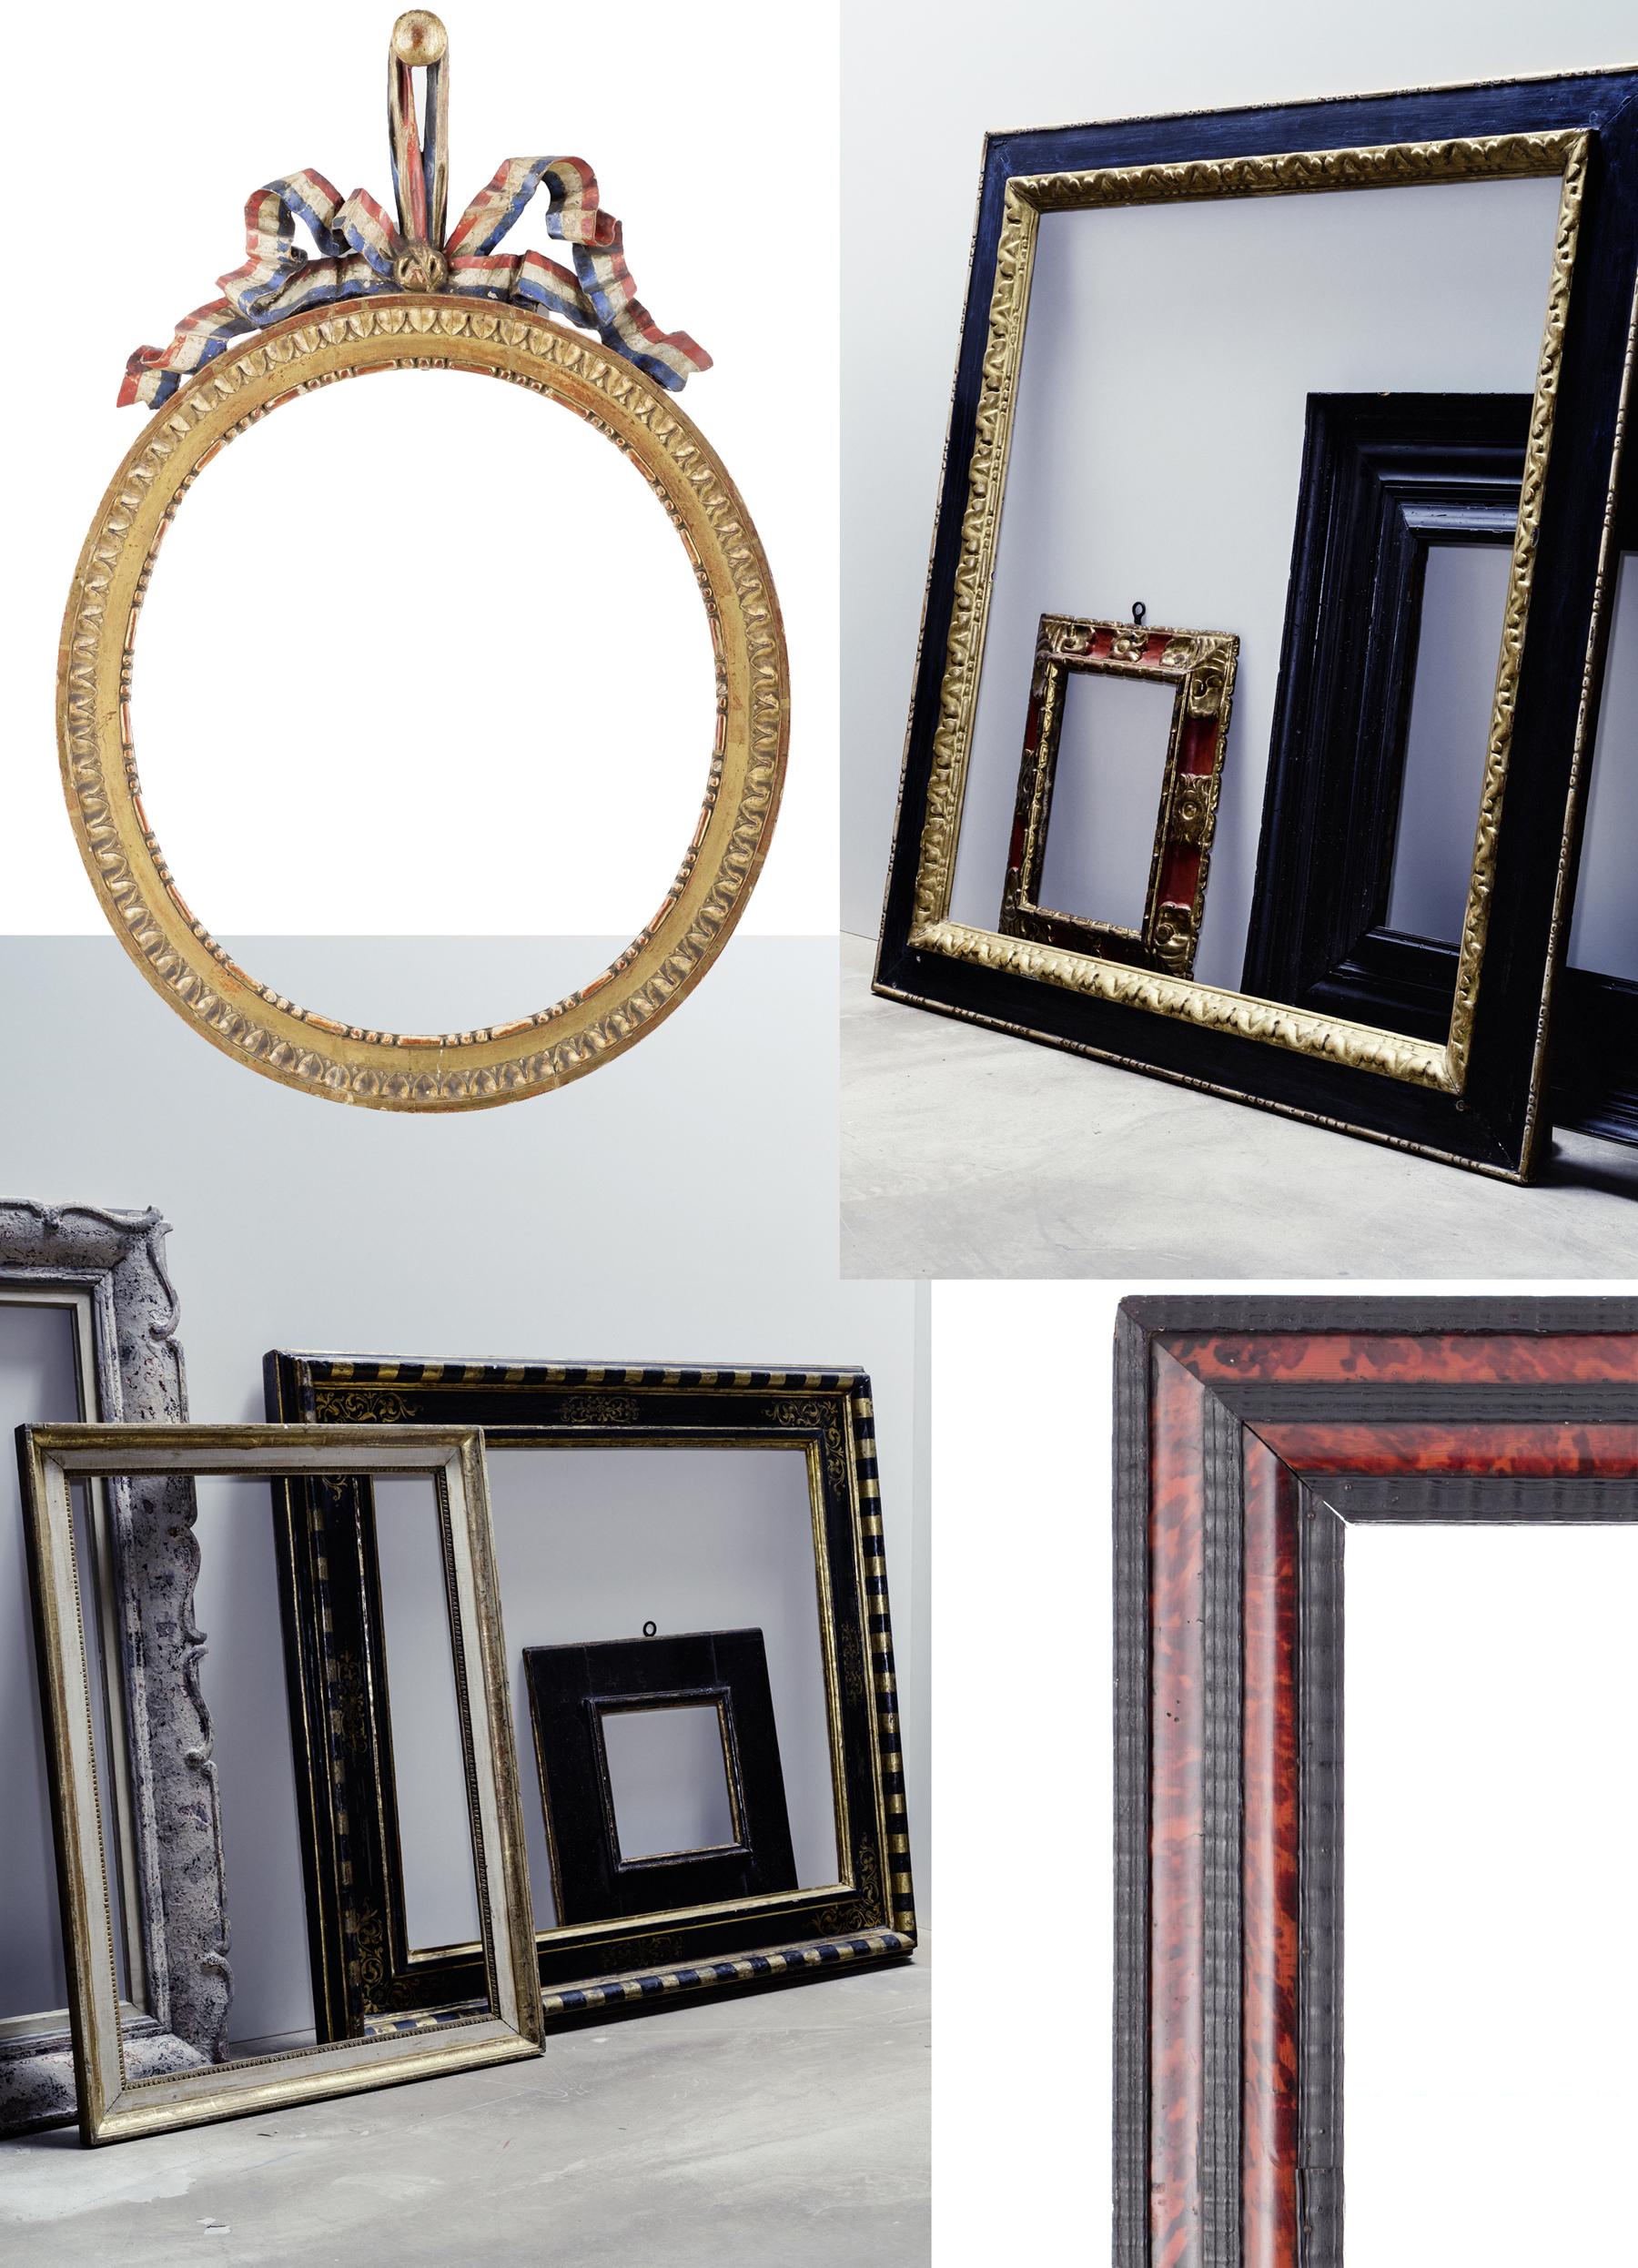 Conzen 13th Antique Frame Auction 2016 | The Frame Blog